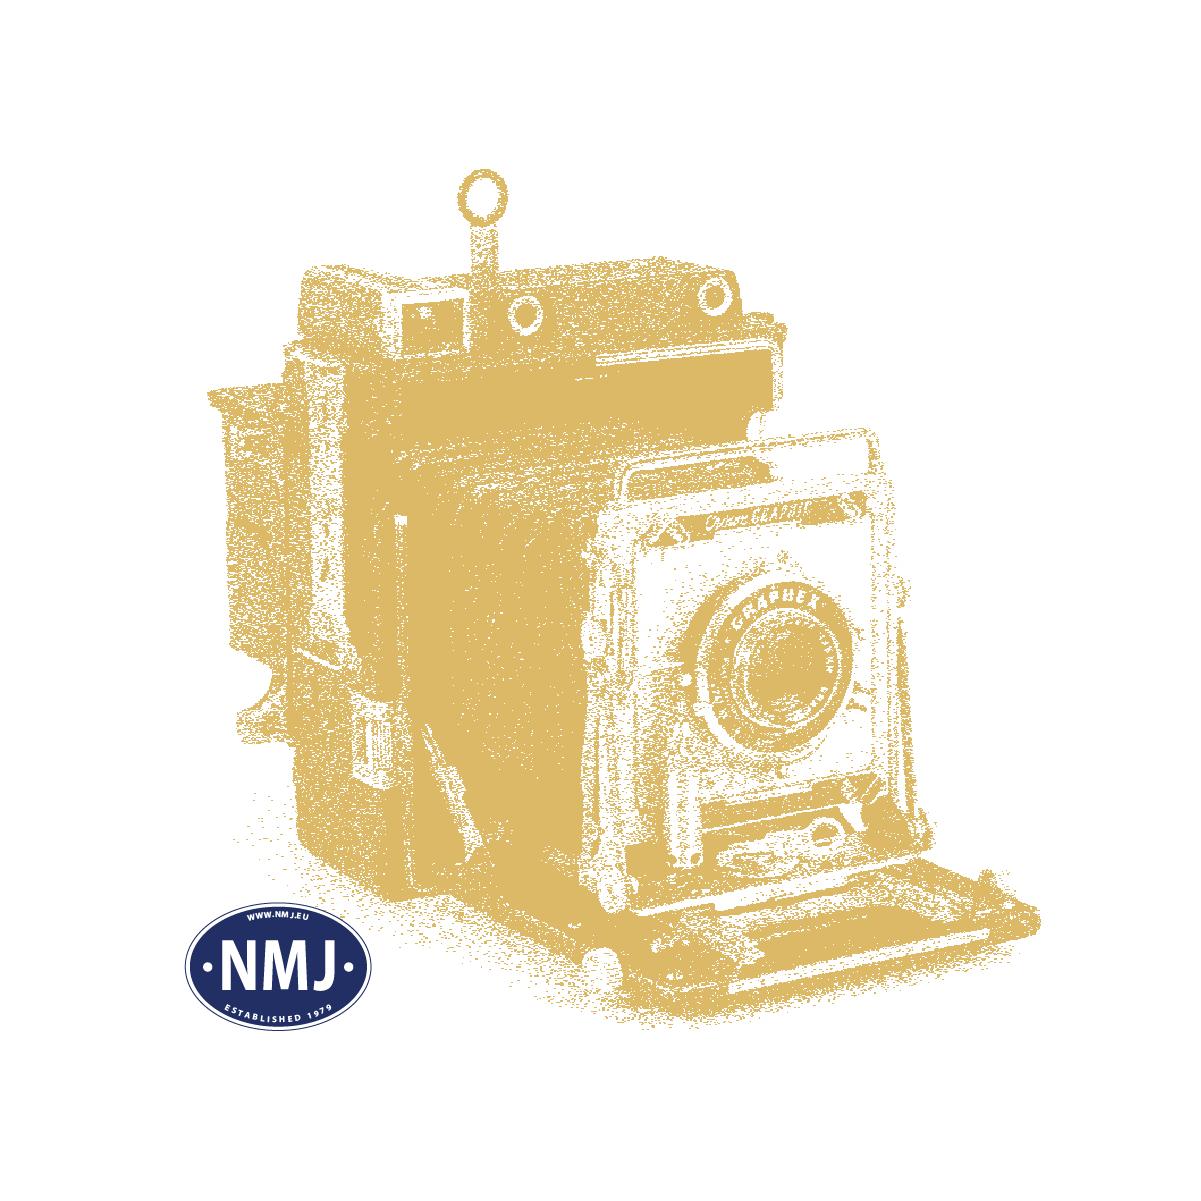 JOS25007 - Nordisk Enebolig, Laser-cut